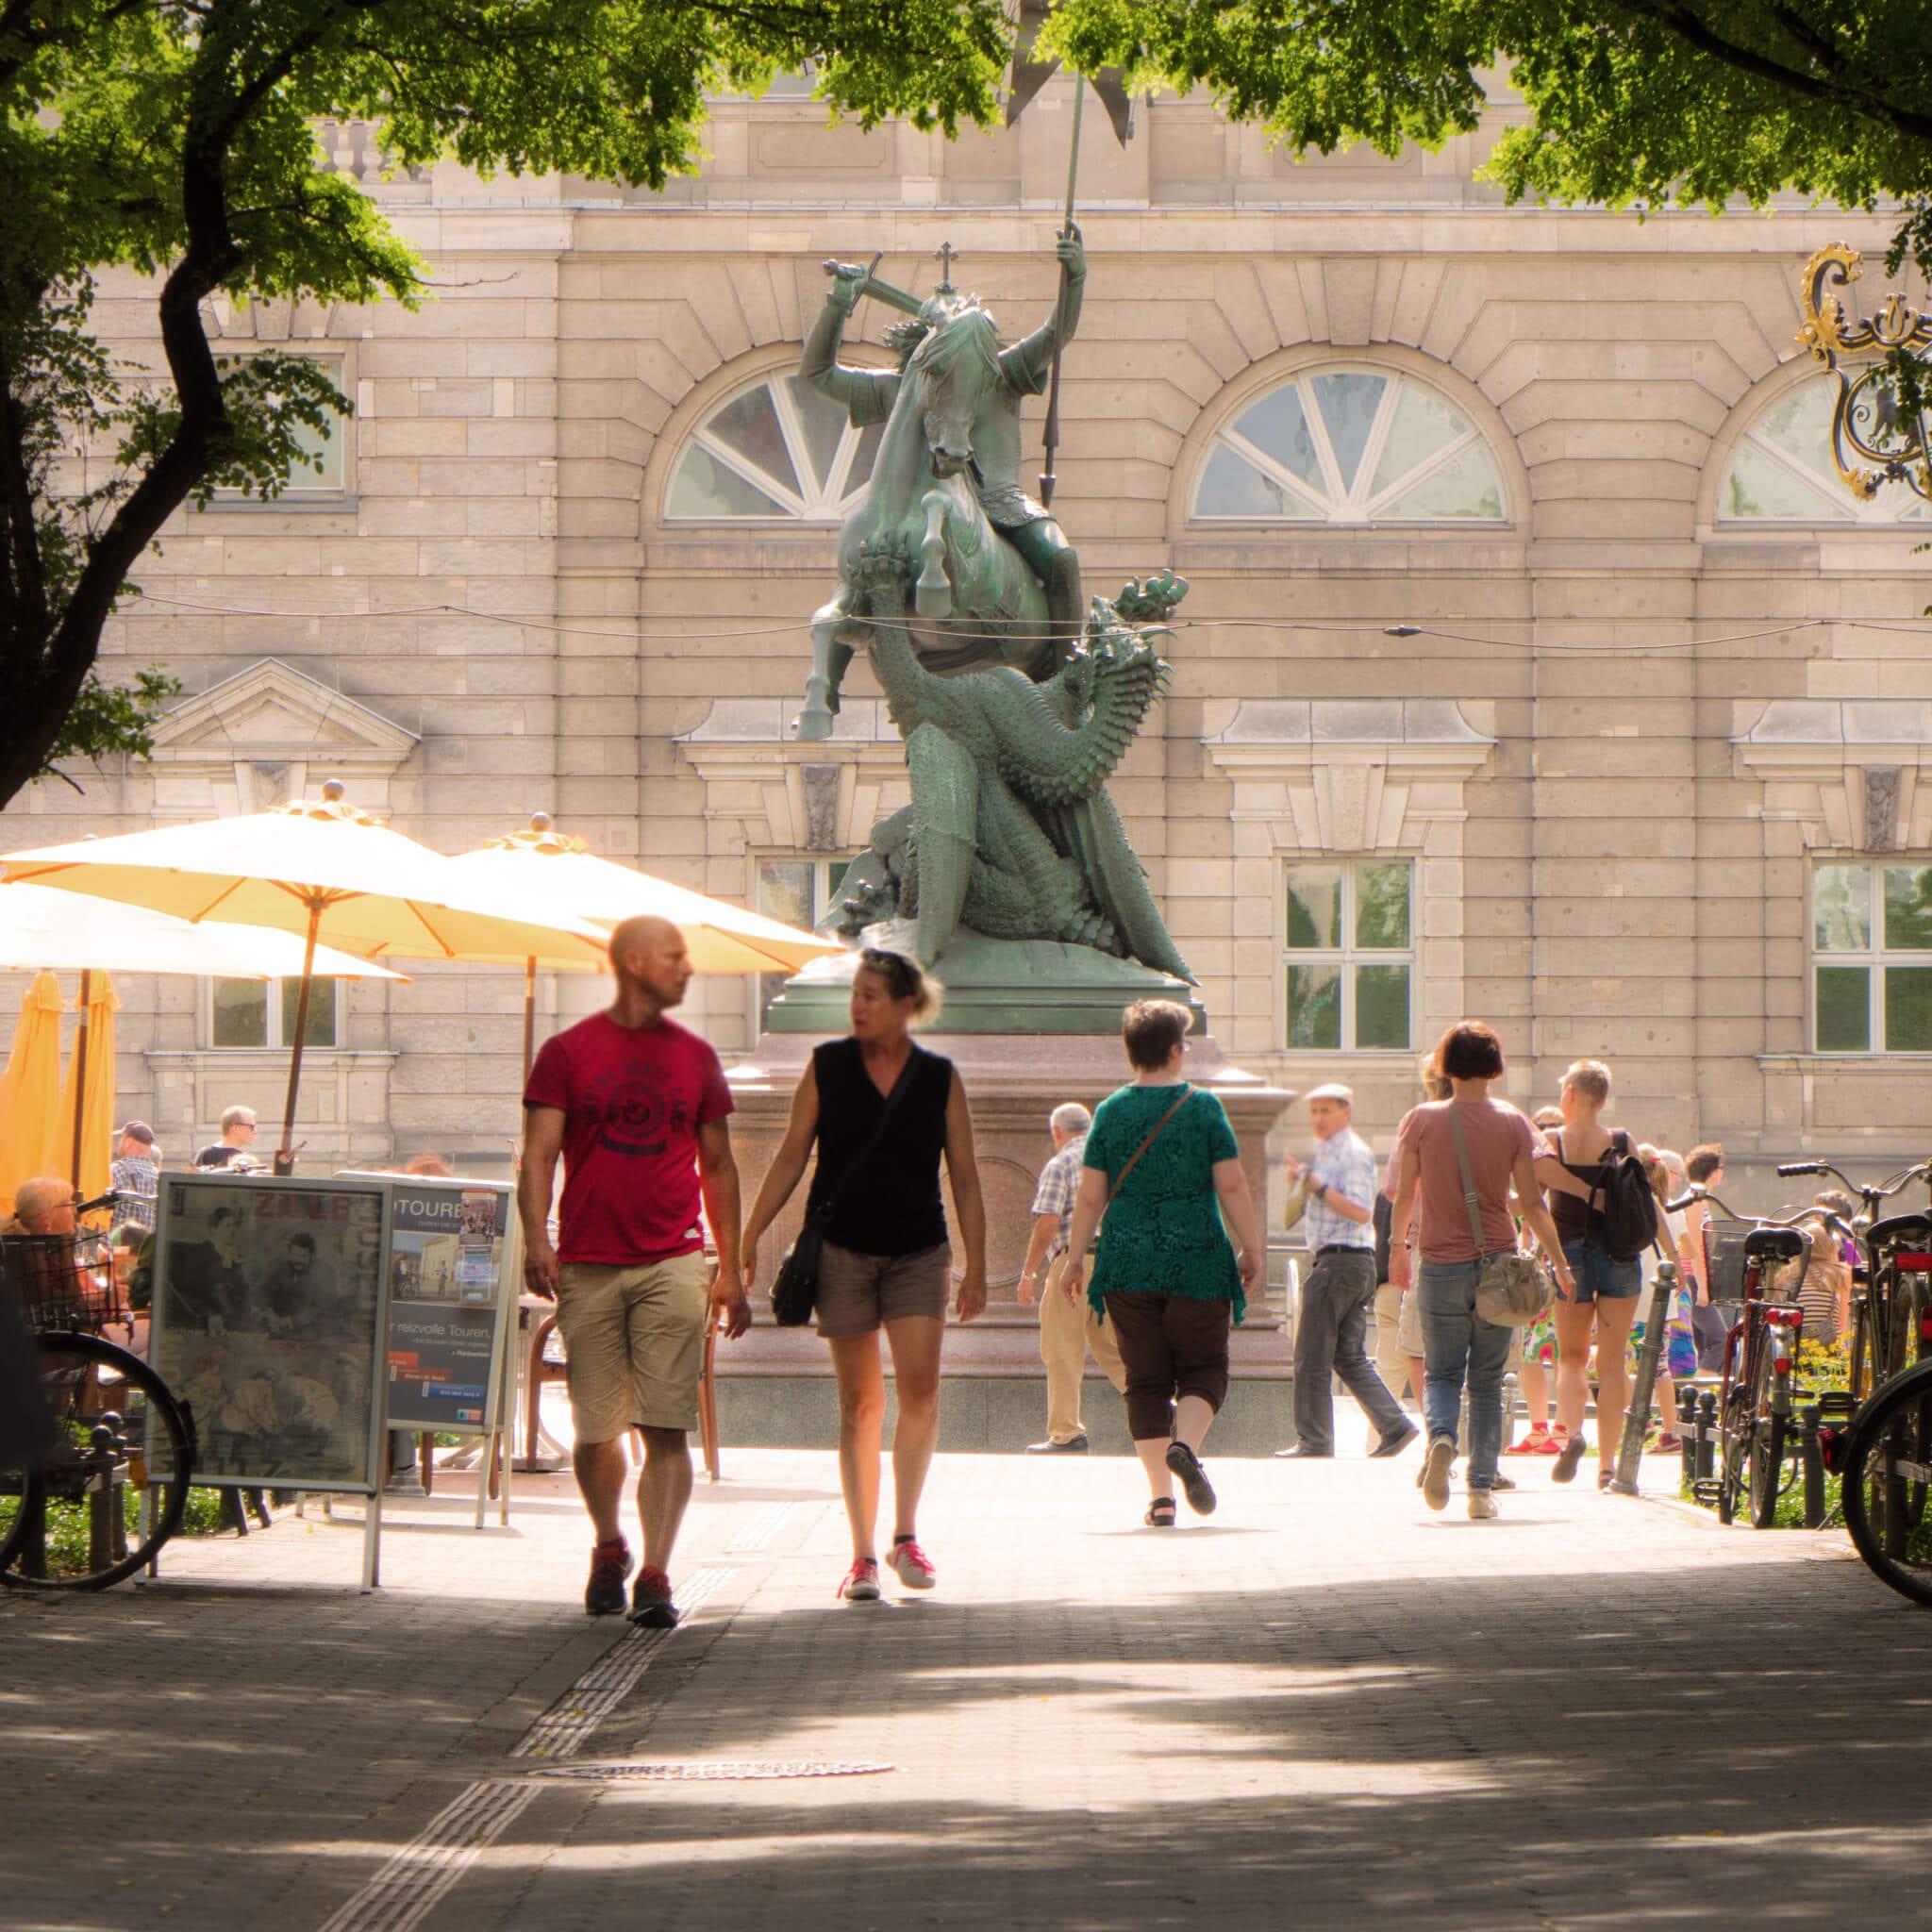 Anlegestelle Nikolaiviertel - Statue Heiliger Georg